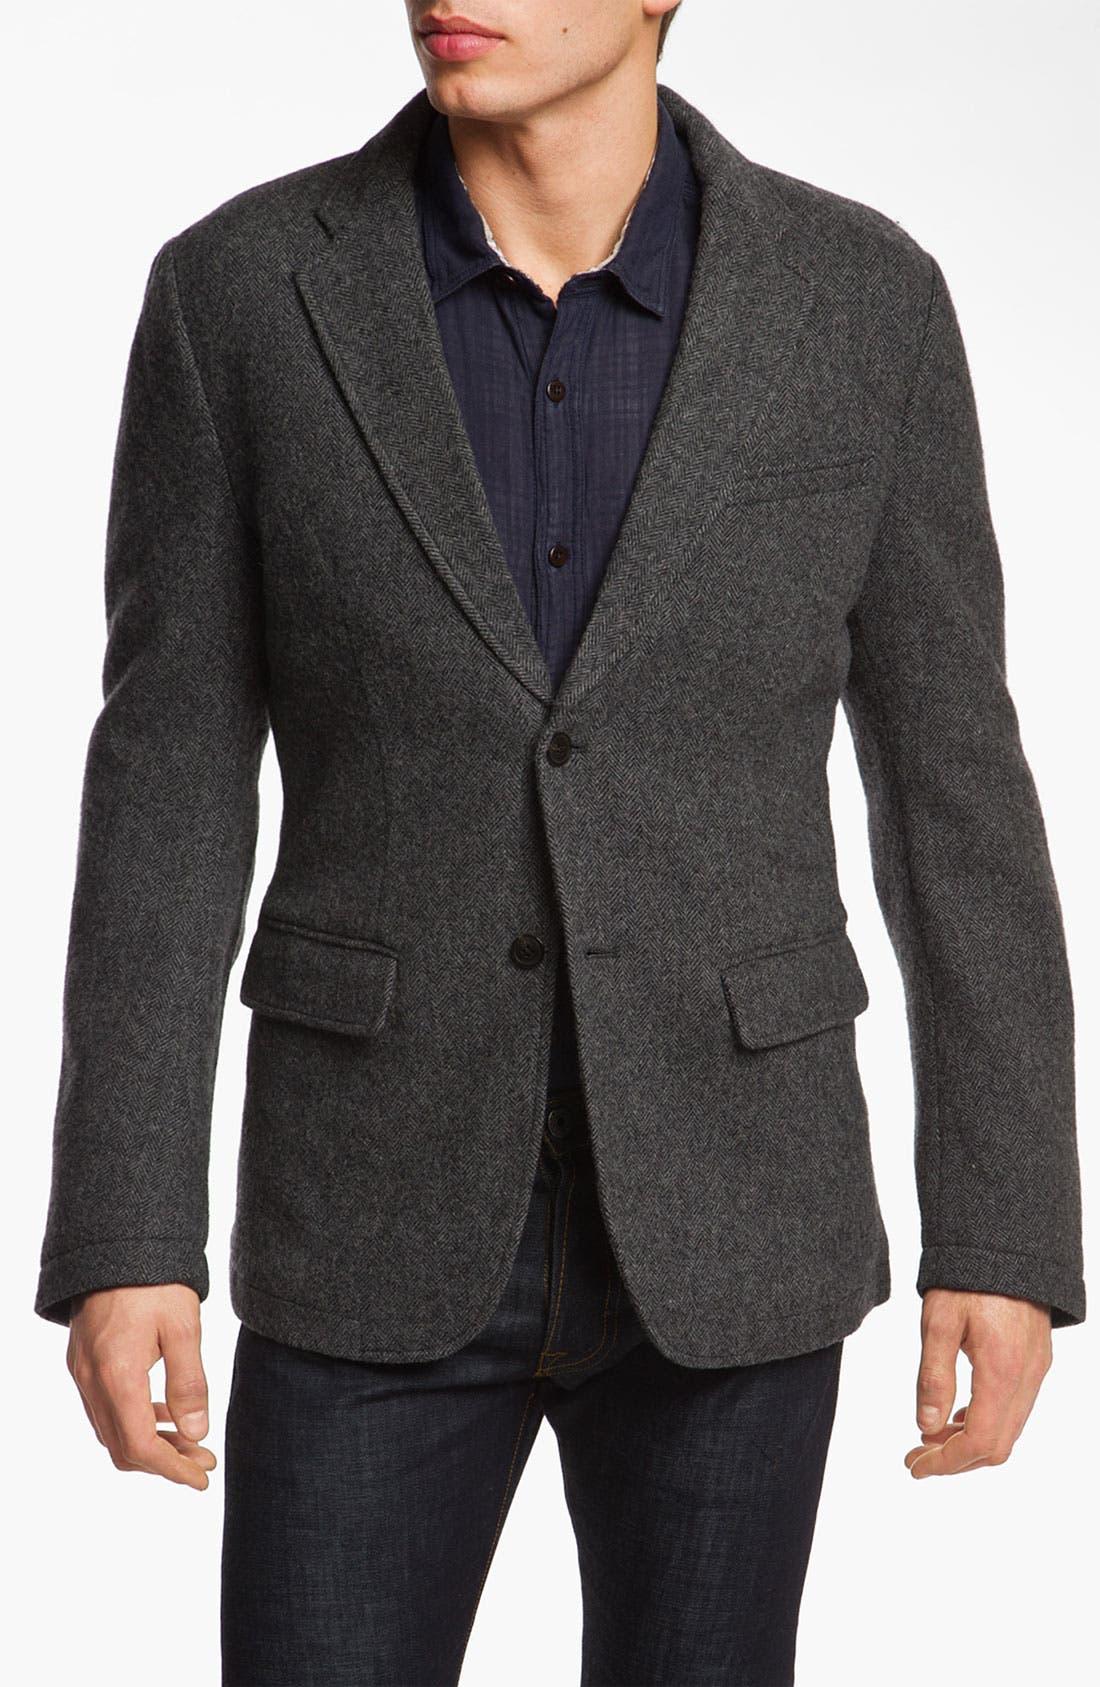 Alternate Image 1 Selected - Woolrich John Rich 'Settlers' Tweed Sportcoat